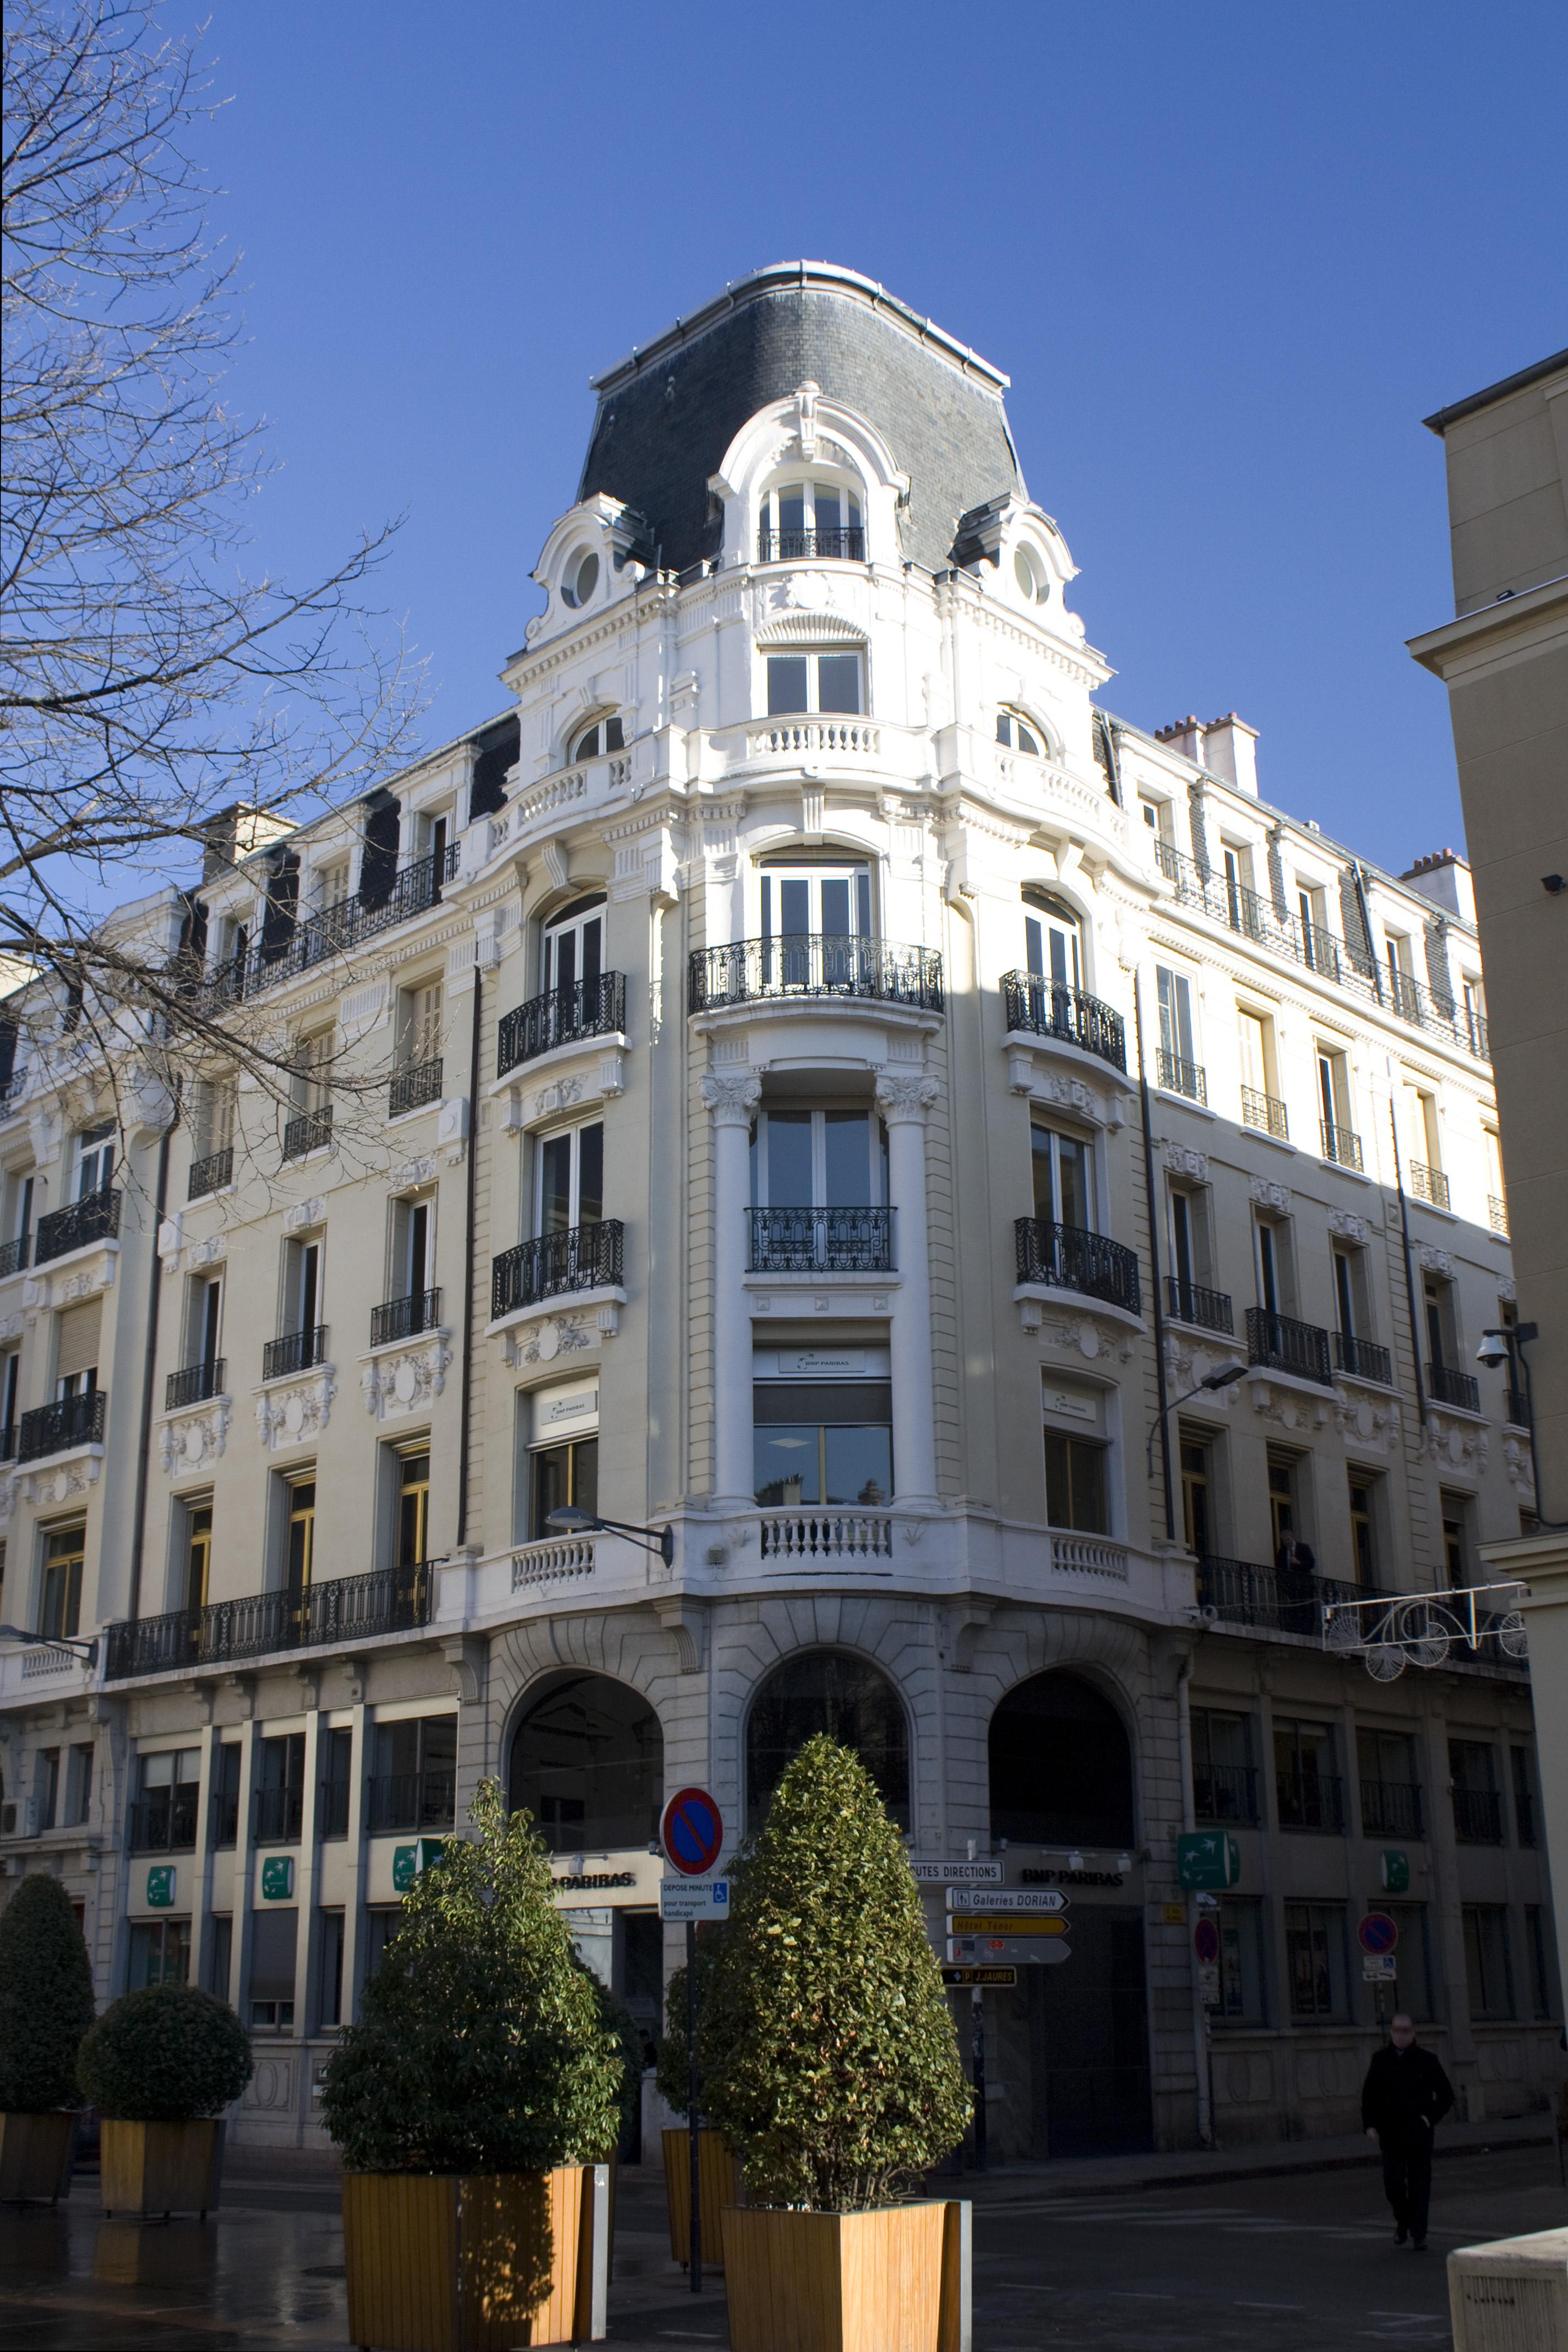 Hotel Saint Etienne Vallee Francaise